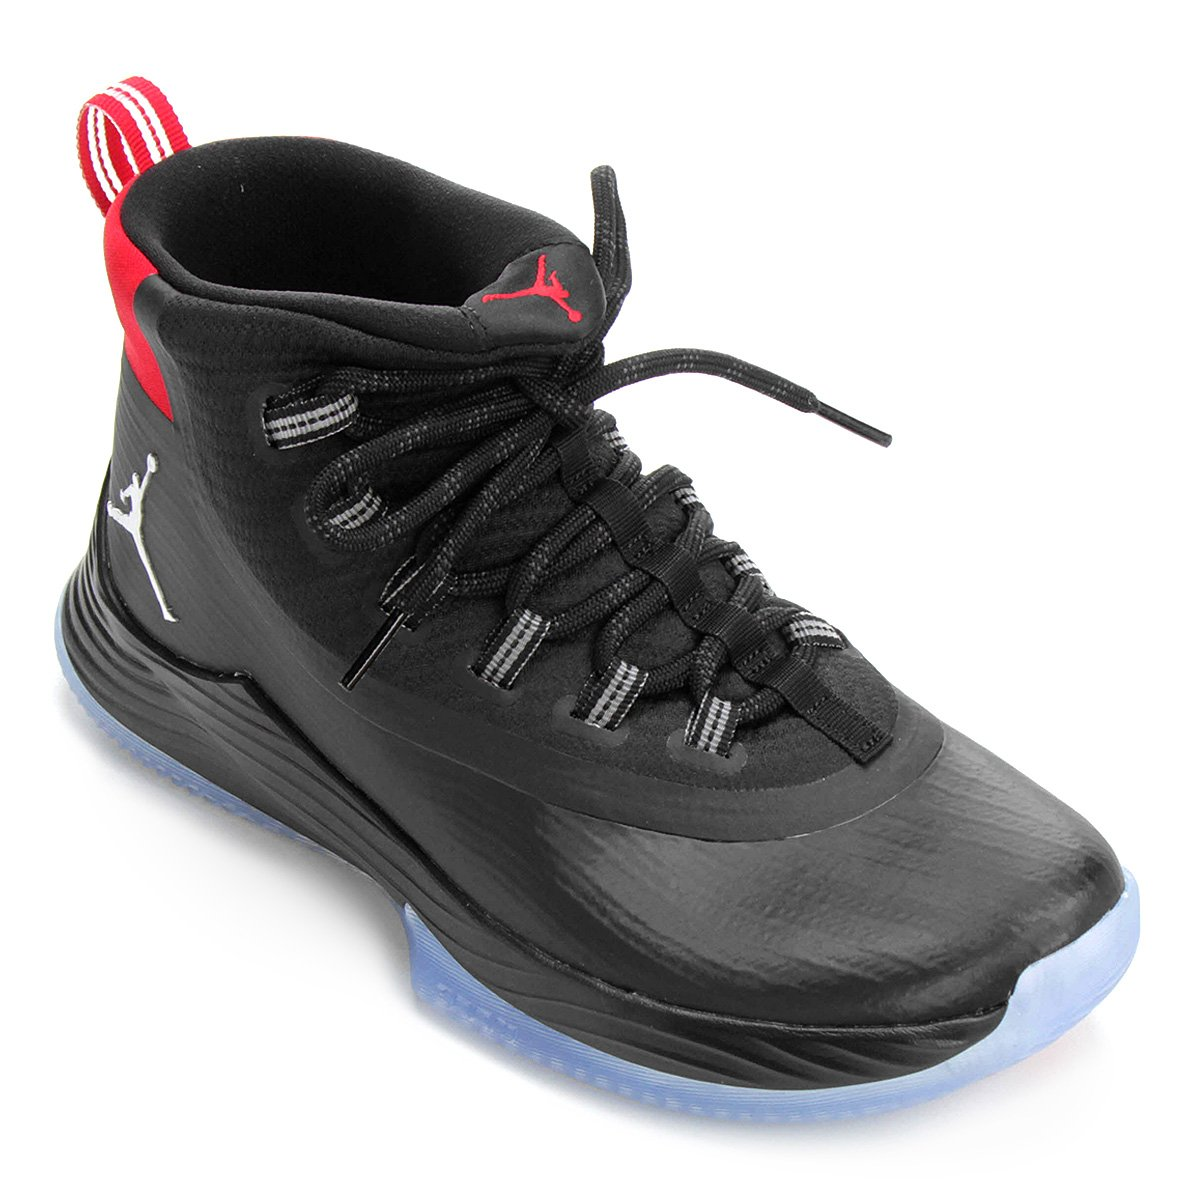 e4f80a045f2e3 Tênis Nike Jordan Ultra Fly 2 Masculino | Loja NBA